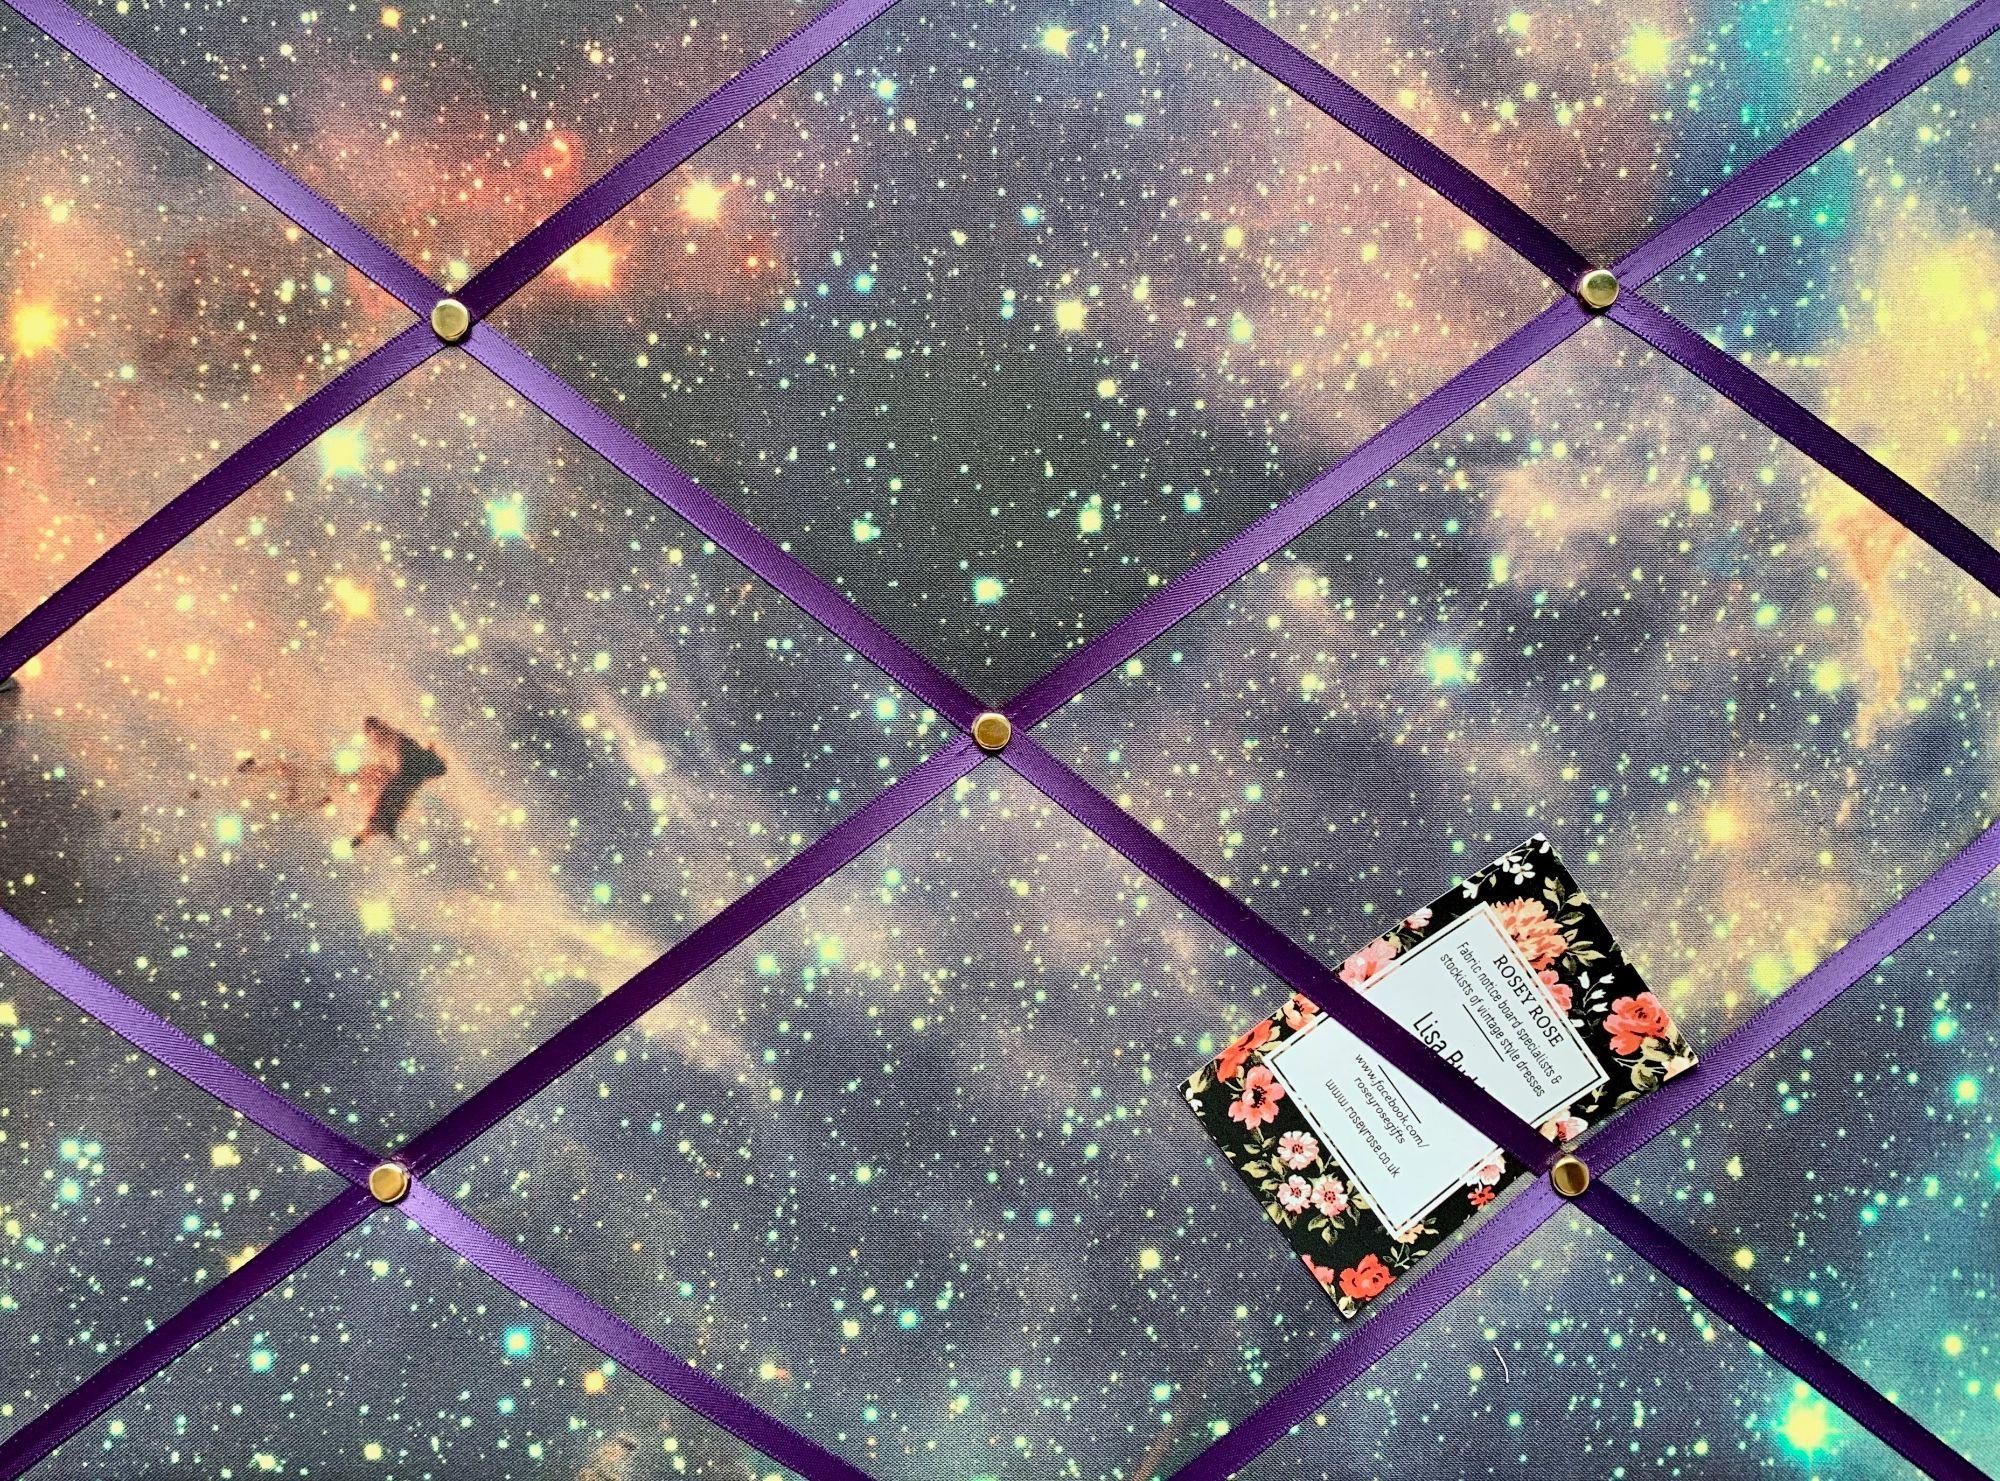 spacemland